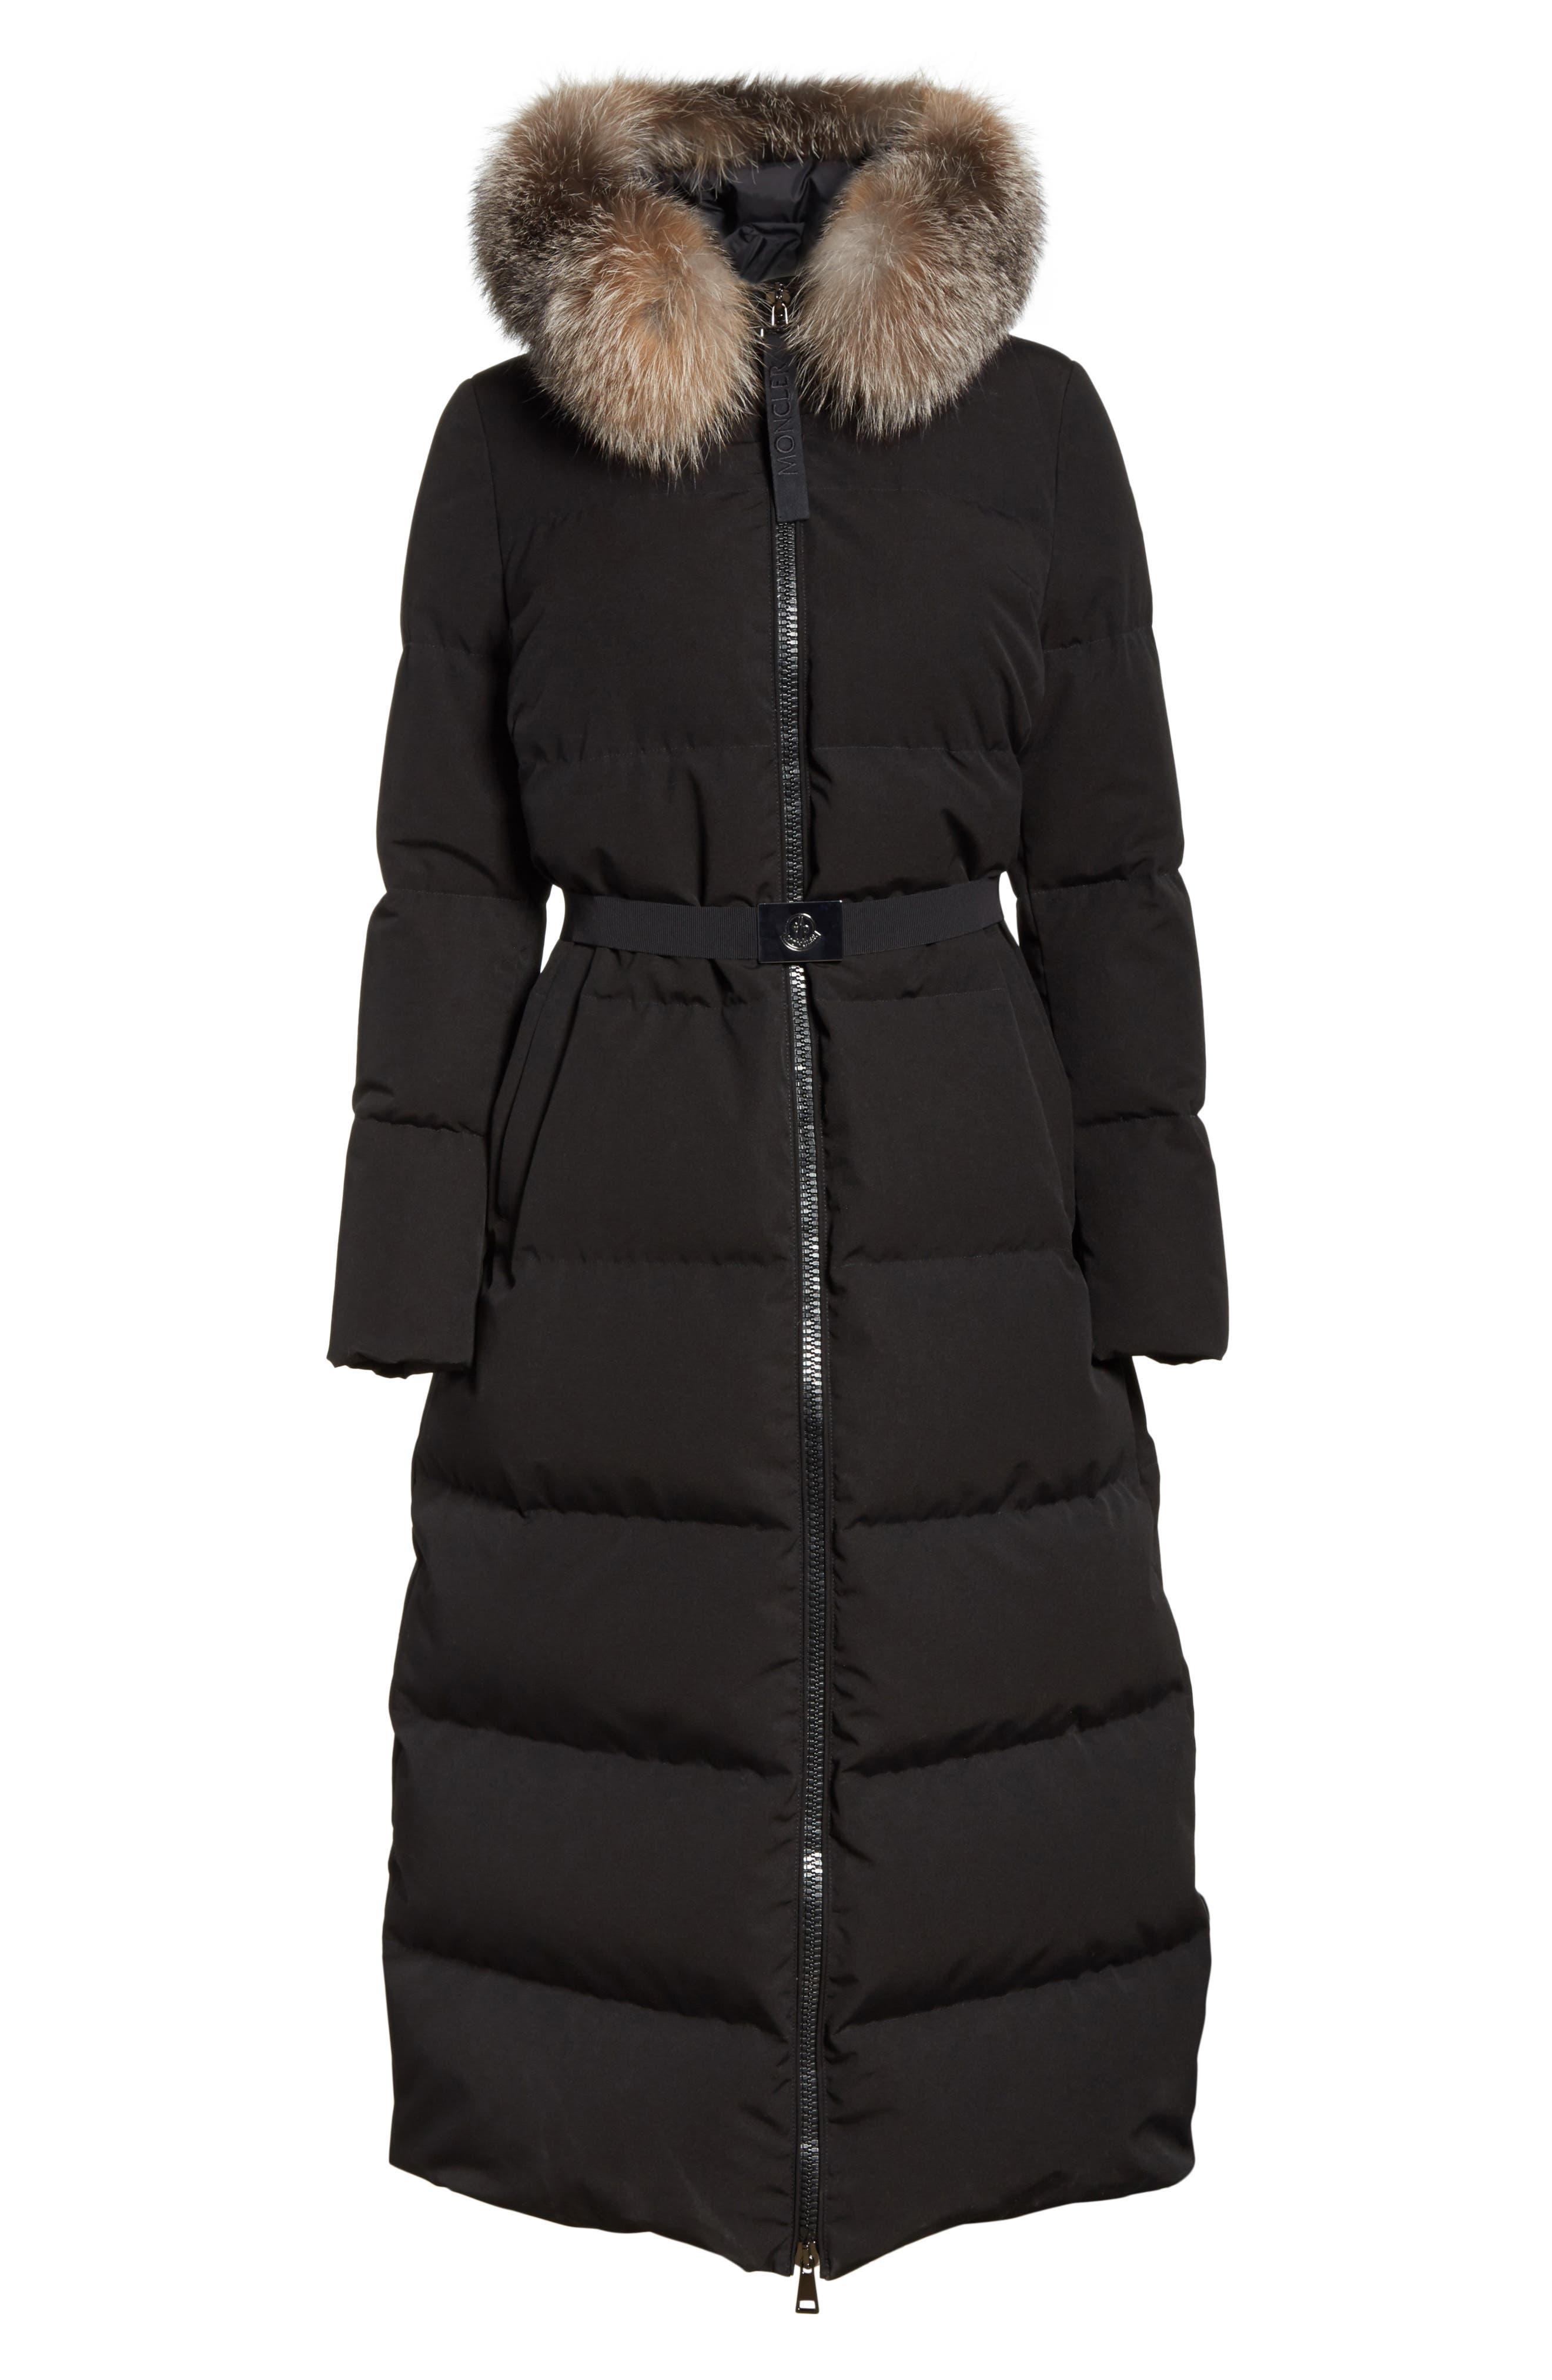 Bernache Hooded Down Coat with Removable Genuine Fox Fur Trim,                             Alternate thumbnail 6, color,                             Black